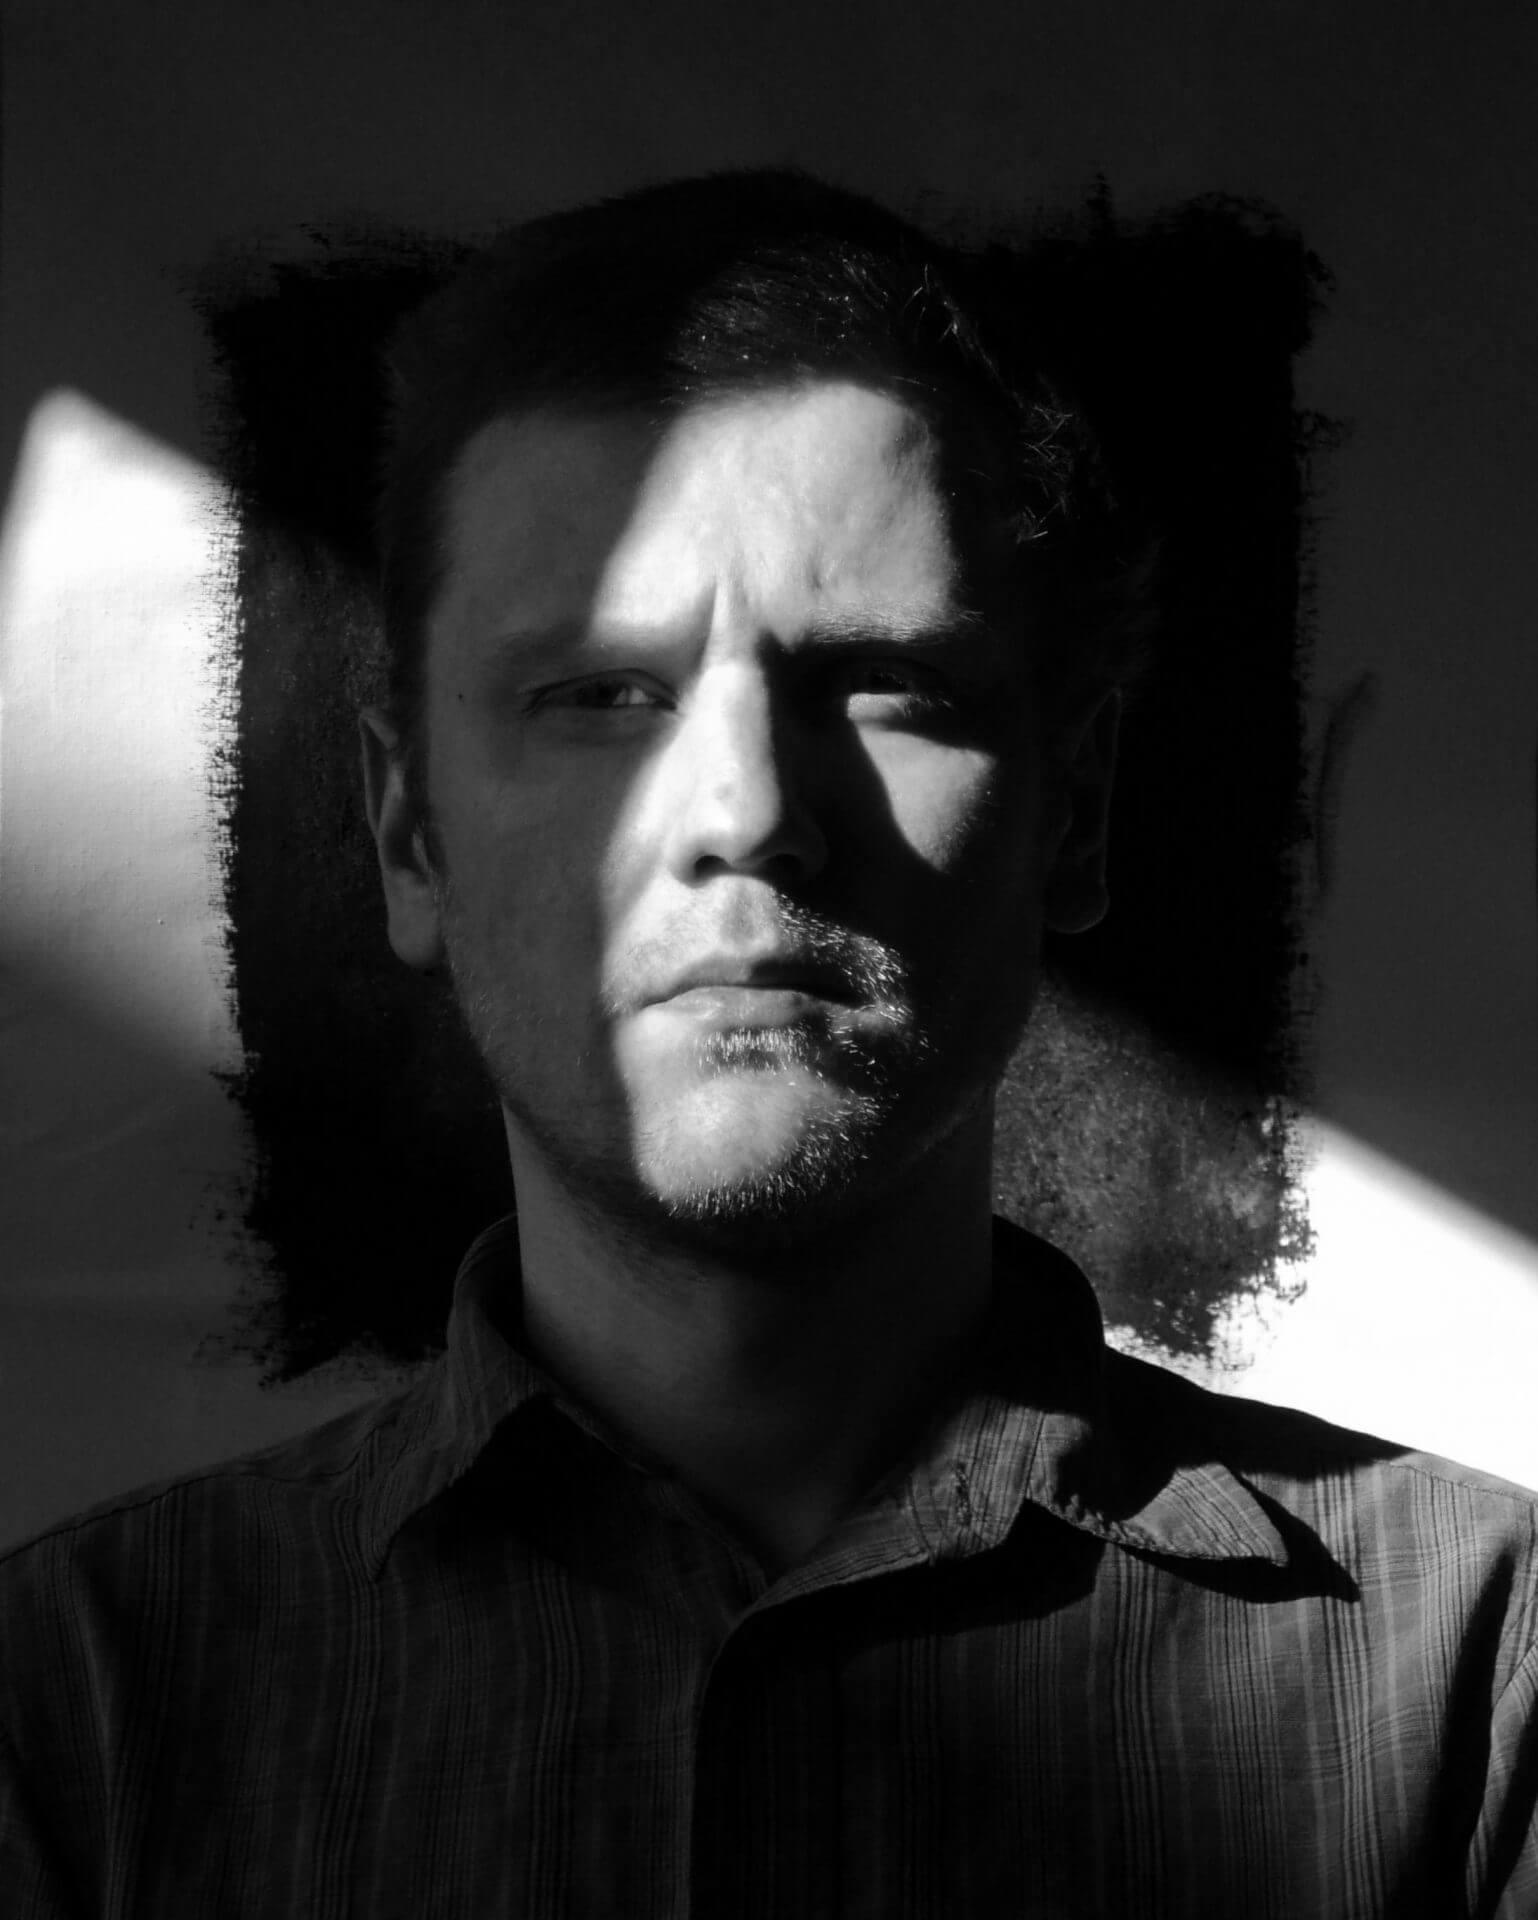 Piotr Mateusz Salomon